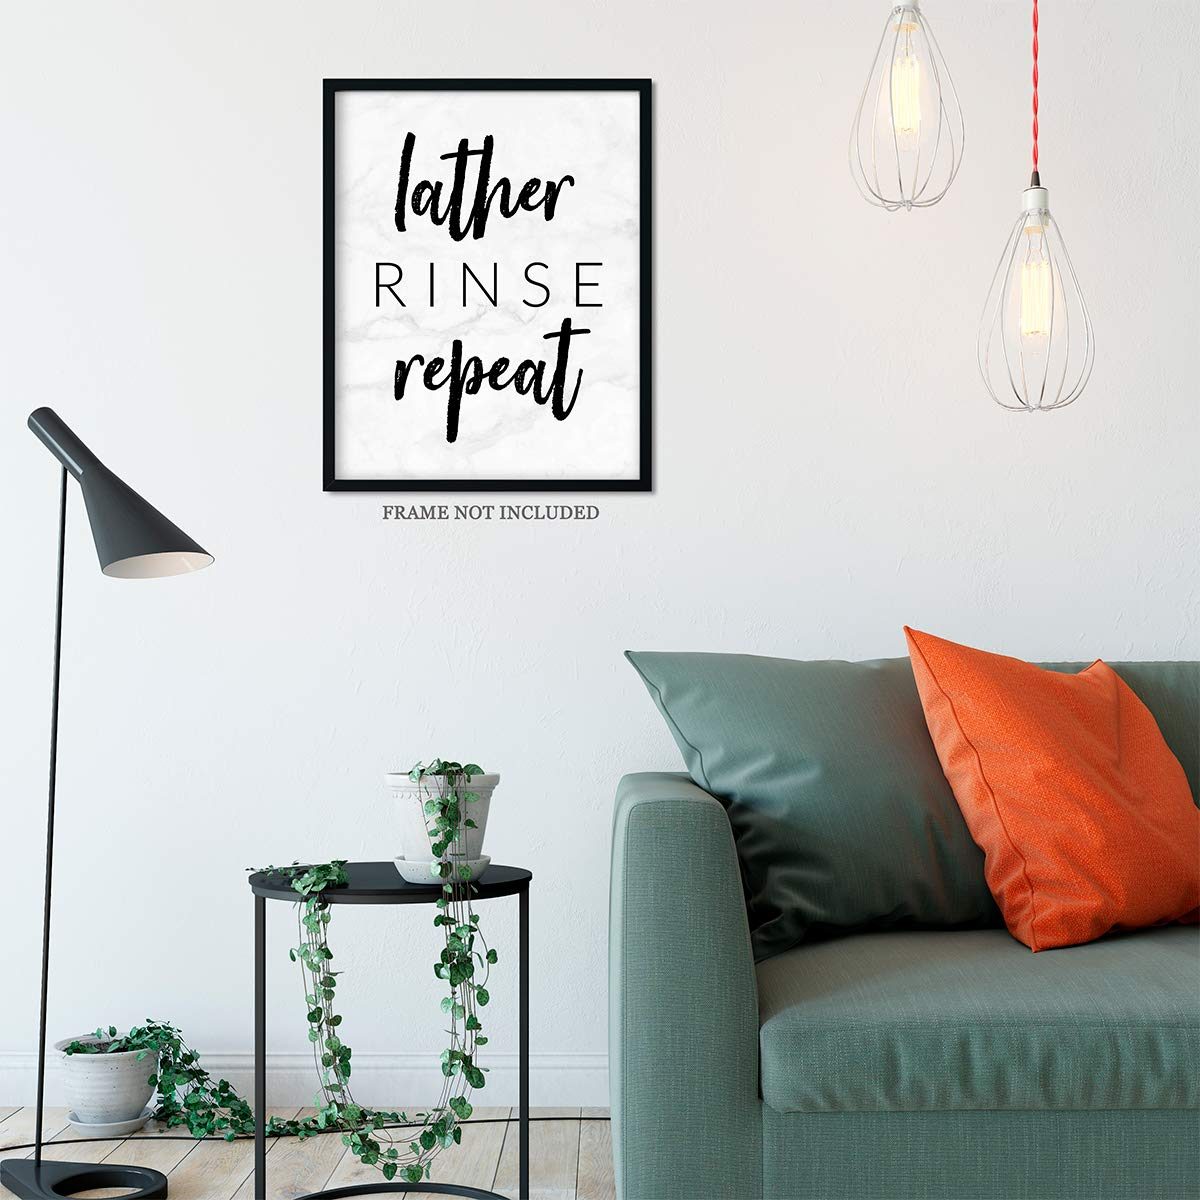 Amazon Com Lather Rinse Repeat Bathroom Wall Art Decor Print 11x14 Unframed Print Handmade